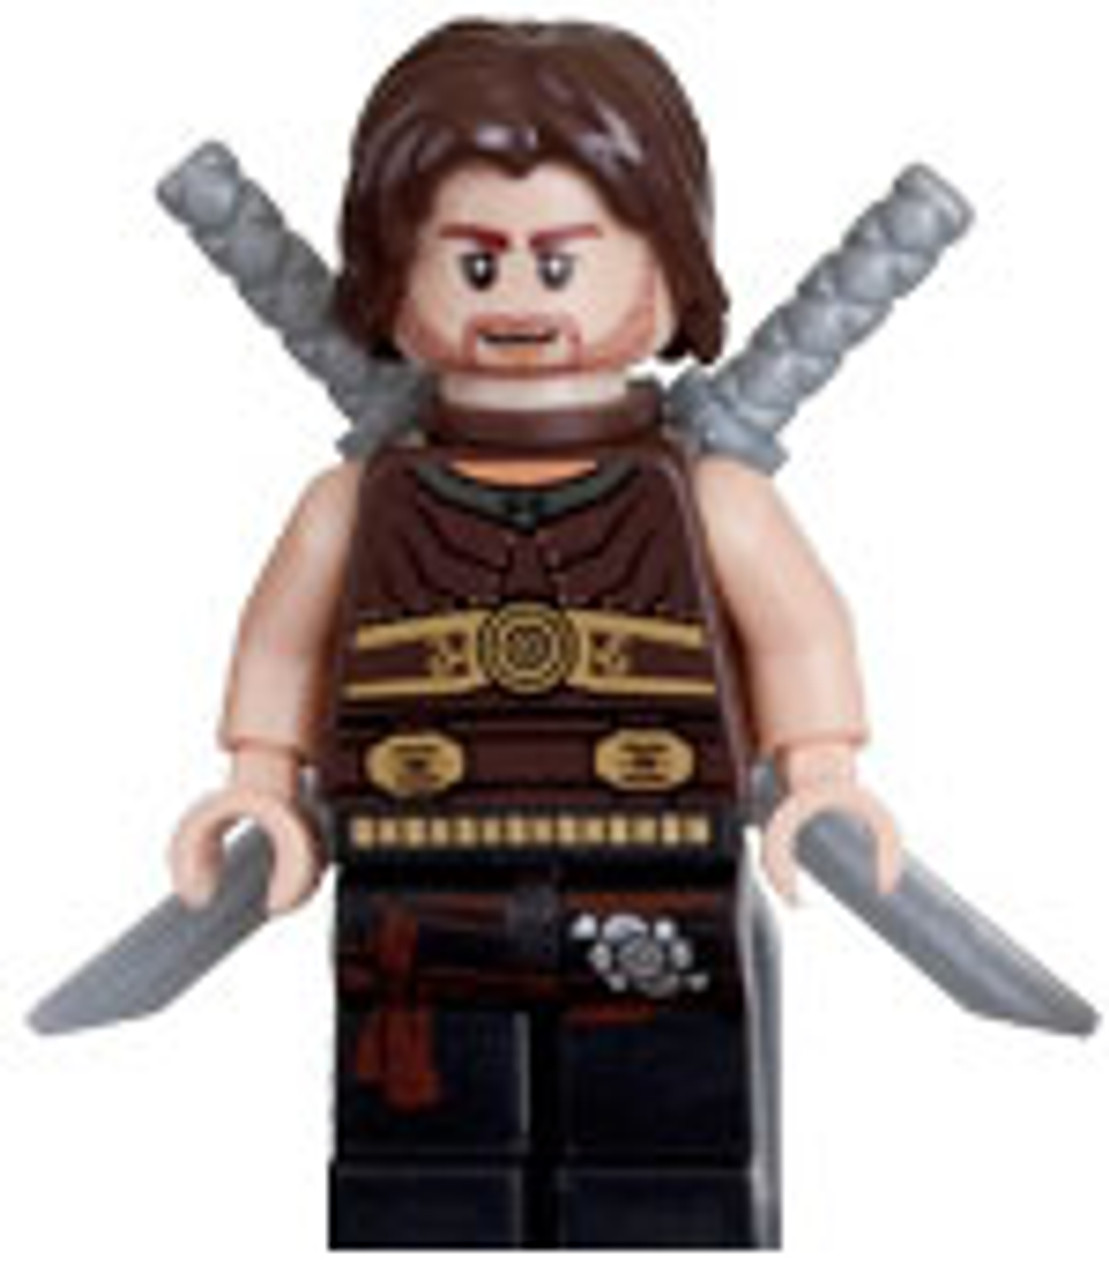 LEGO Prince of Persia Loose Dastan Minifigure [Loose]